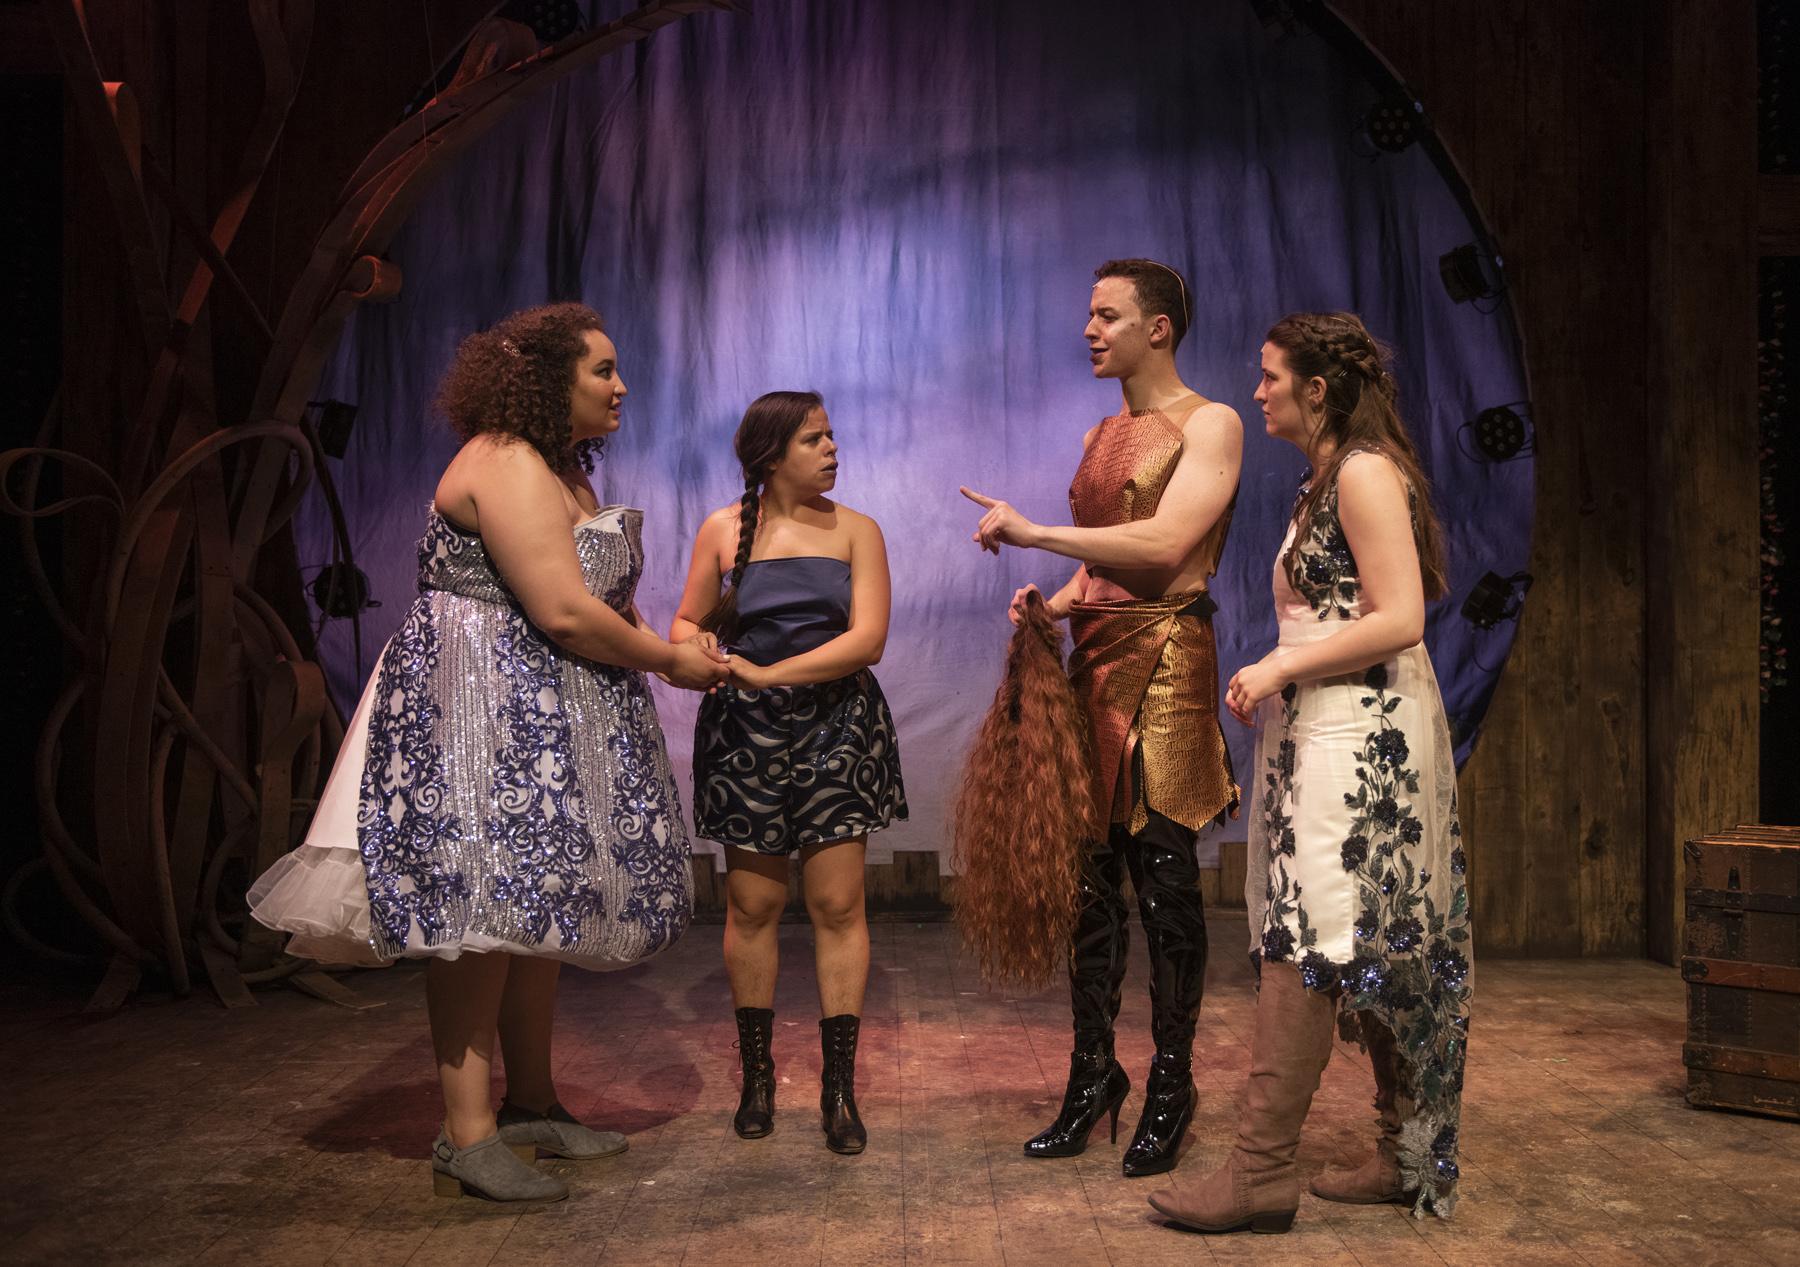 Pamela (bridget Adams-King), Mopsa (Deanalís Resto), Musidorus (Jeremiah Alsop), and Philoclea (Caitlyn Cerza)